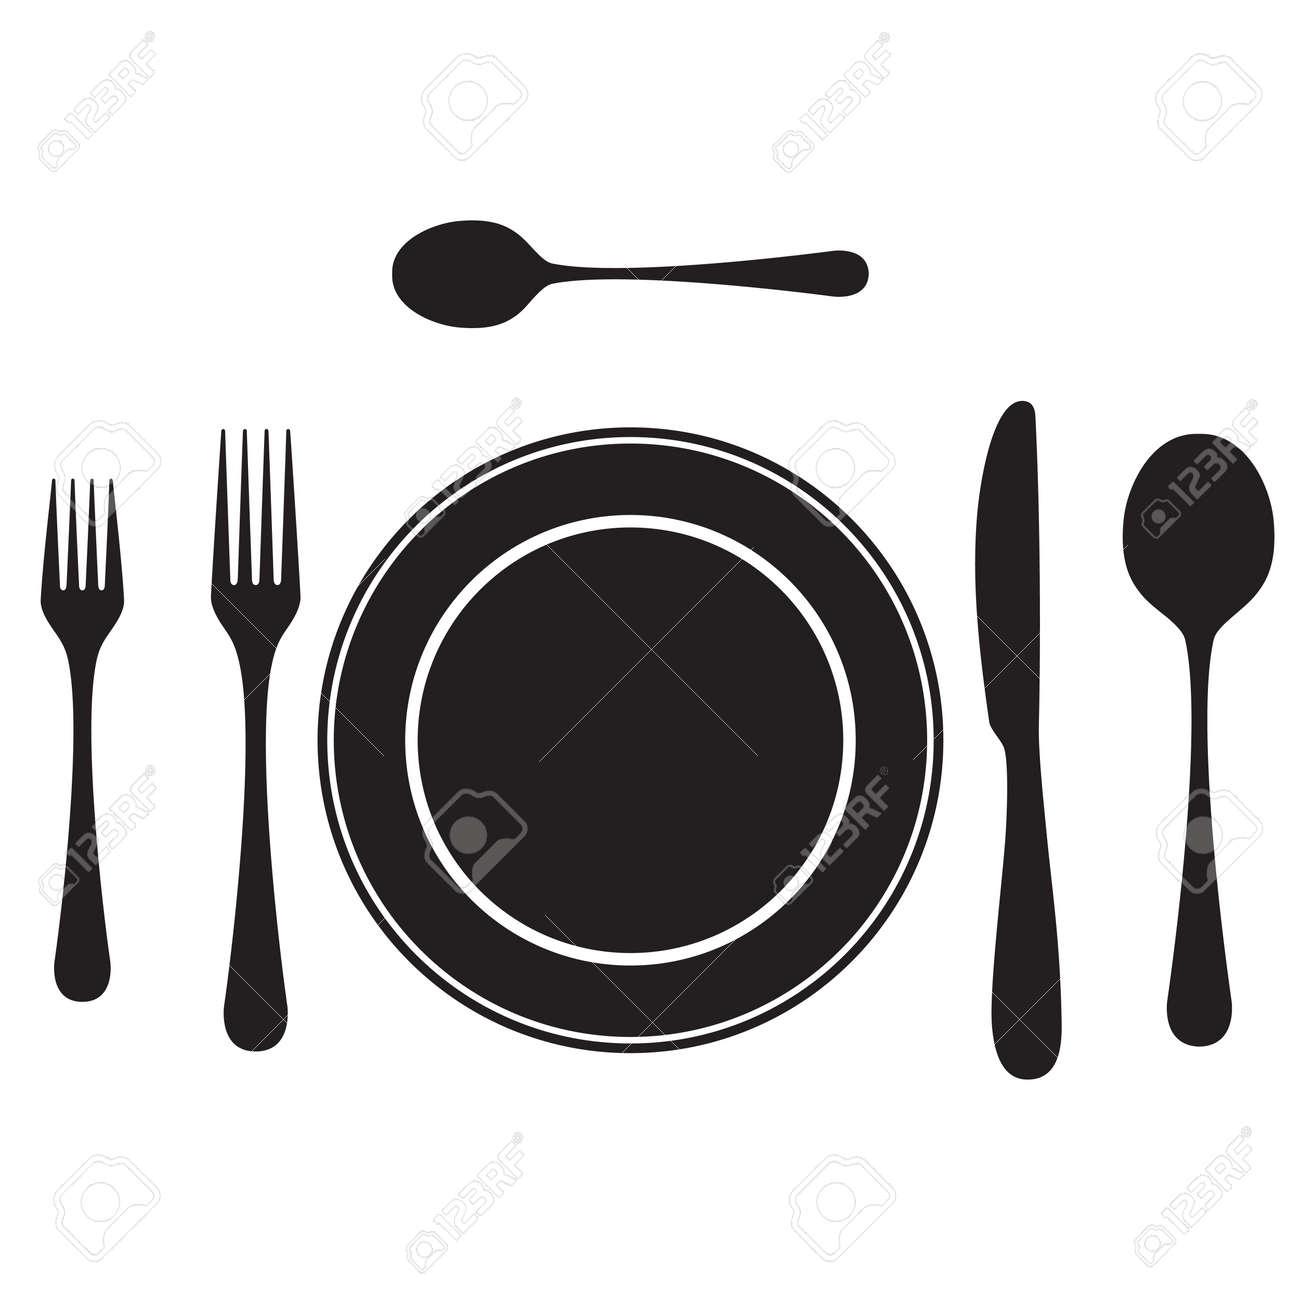 Black silhouettes of cutlery tableware. Table setting. Etiquette. Top view. Elements  sc 1 st  123RF.com & Black Silhouettes Of Cutlery Tableware. Table Setting. Etiquette ...